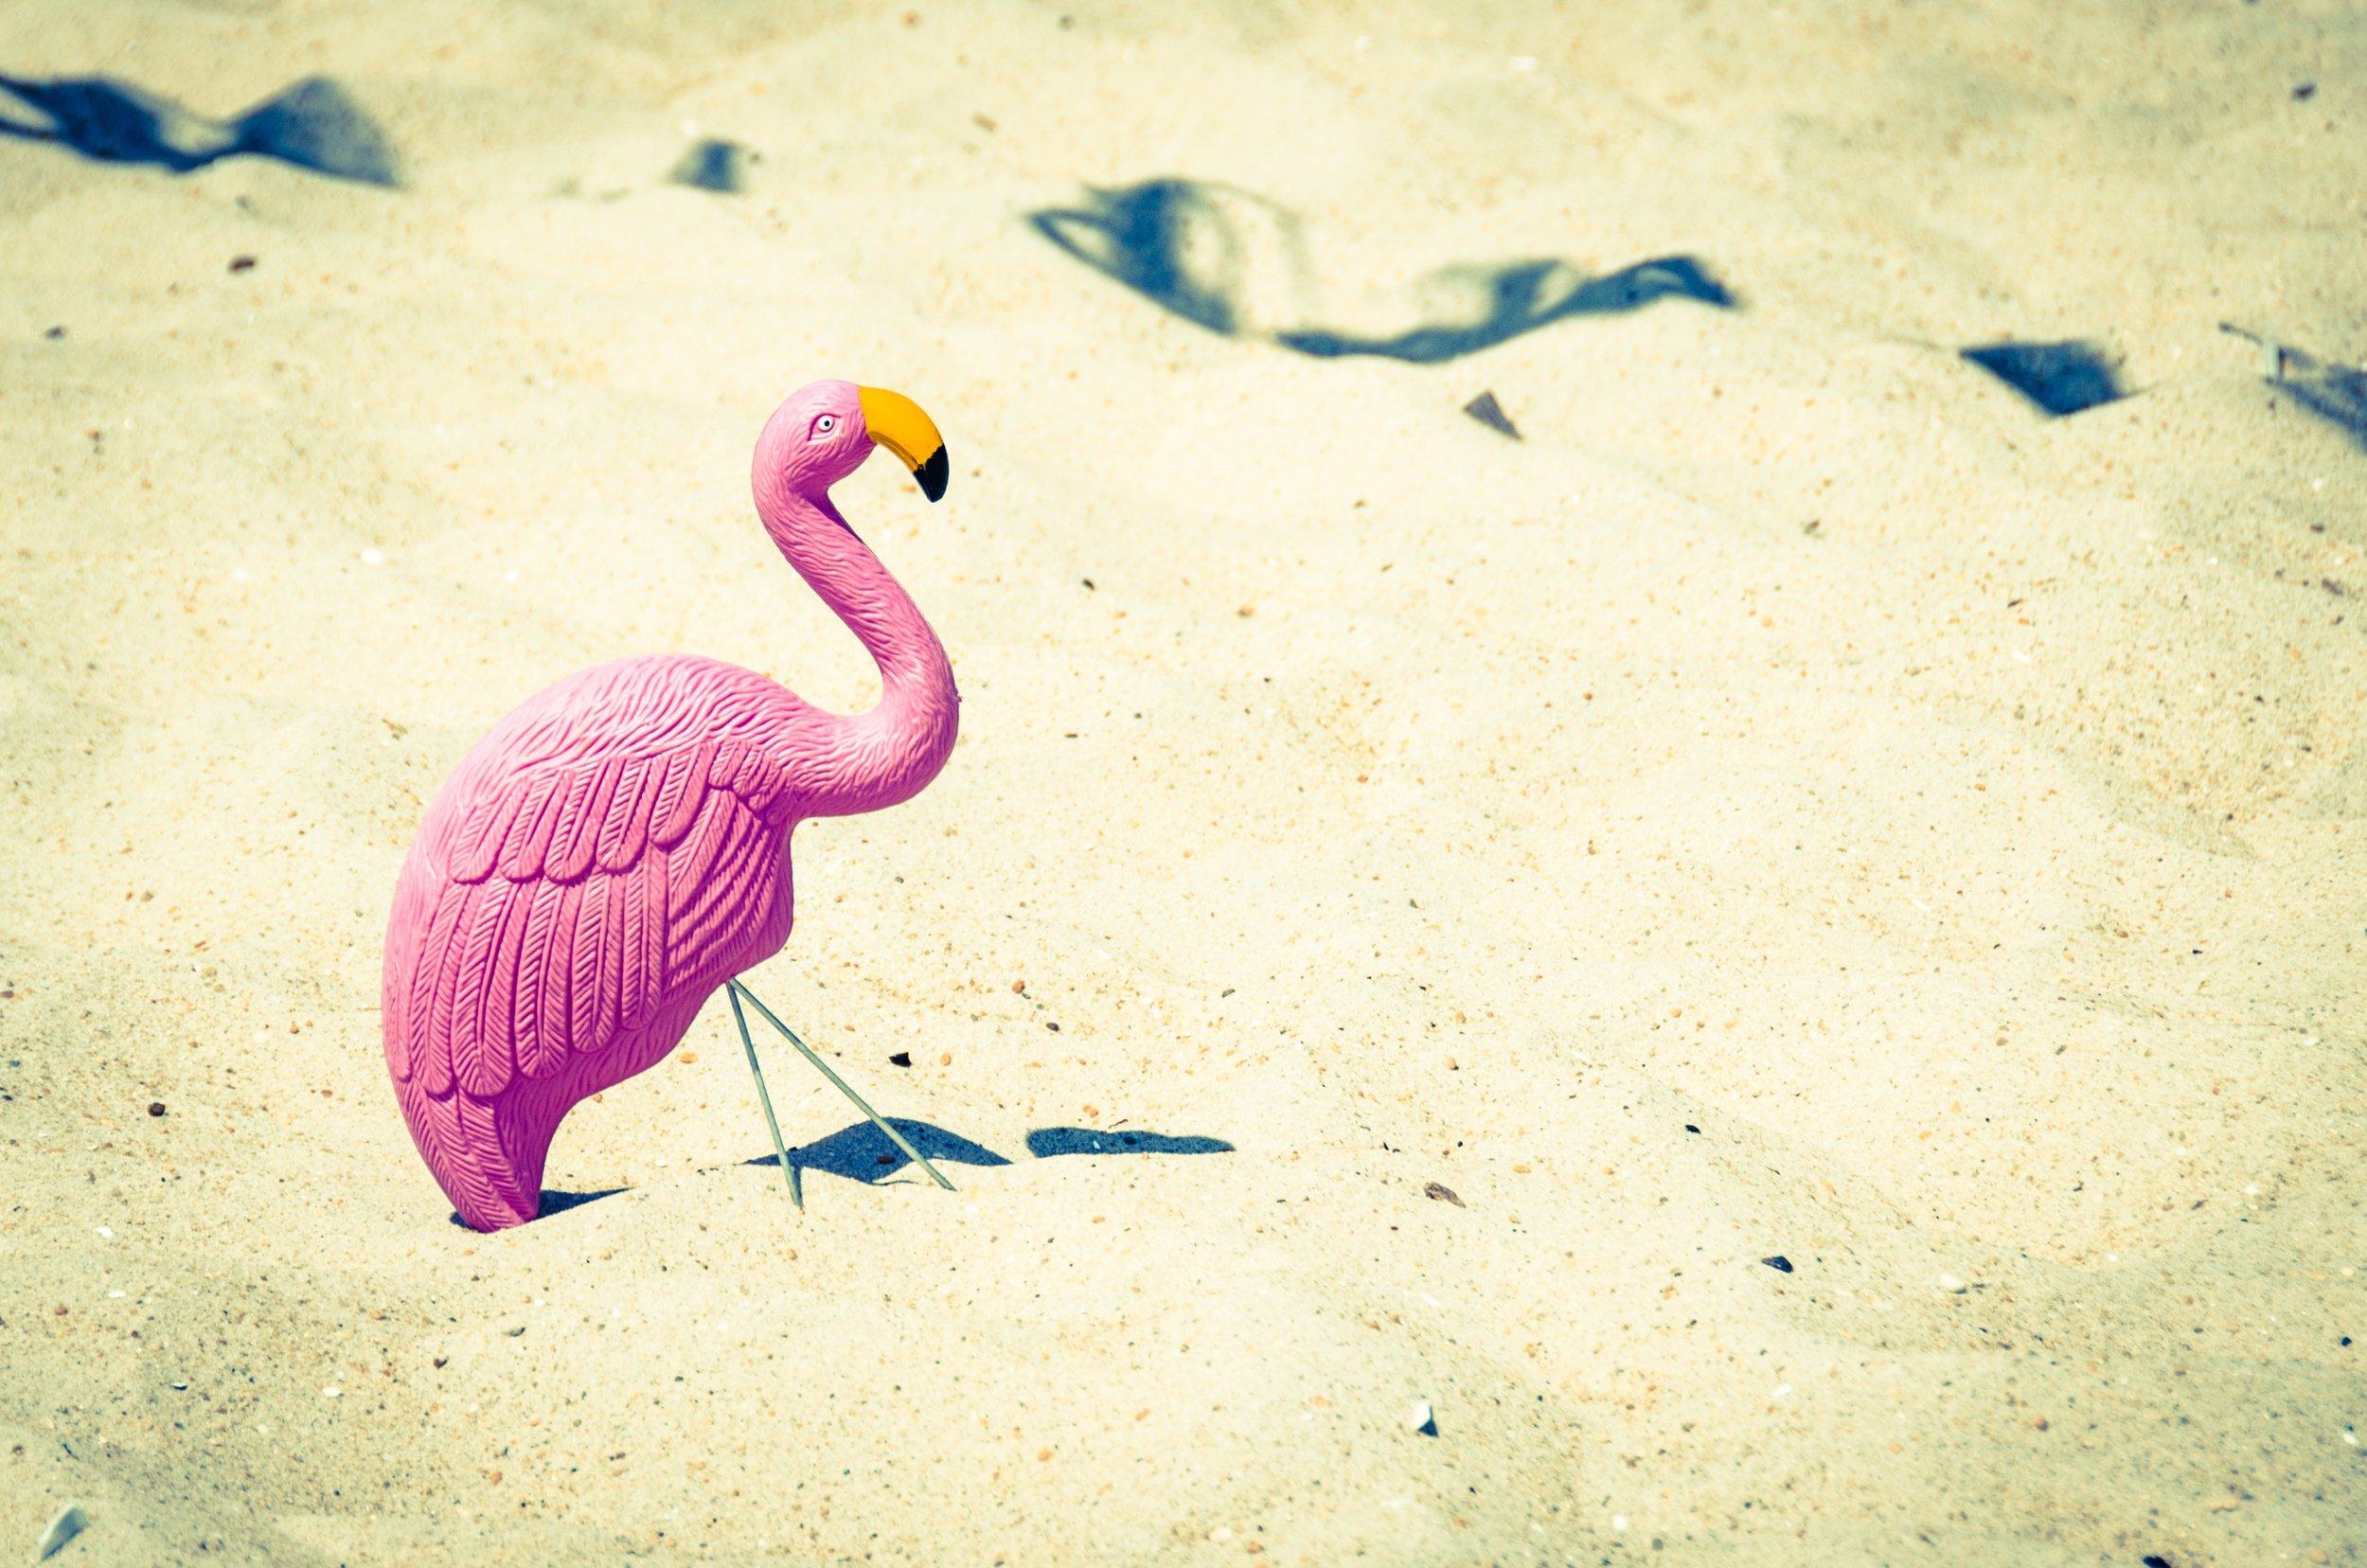 flamingo-StockSnap_3FG2PAQ7OM.jpg